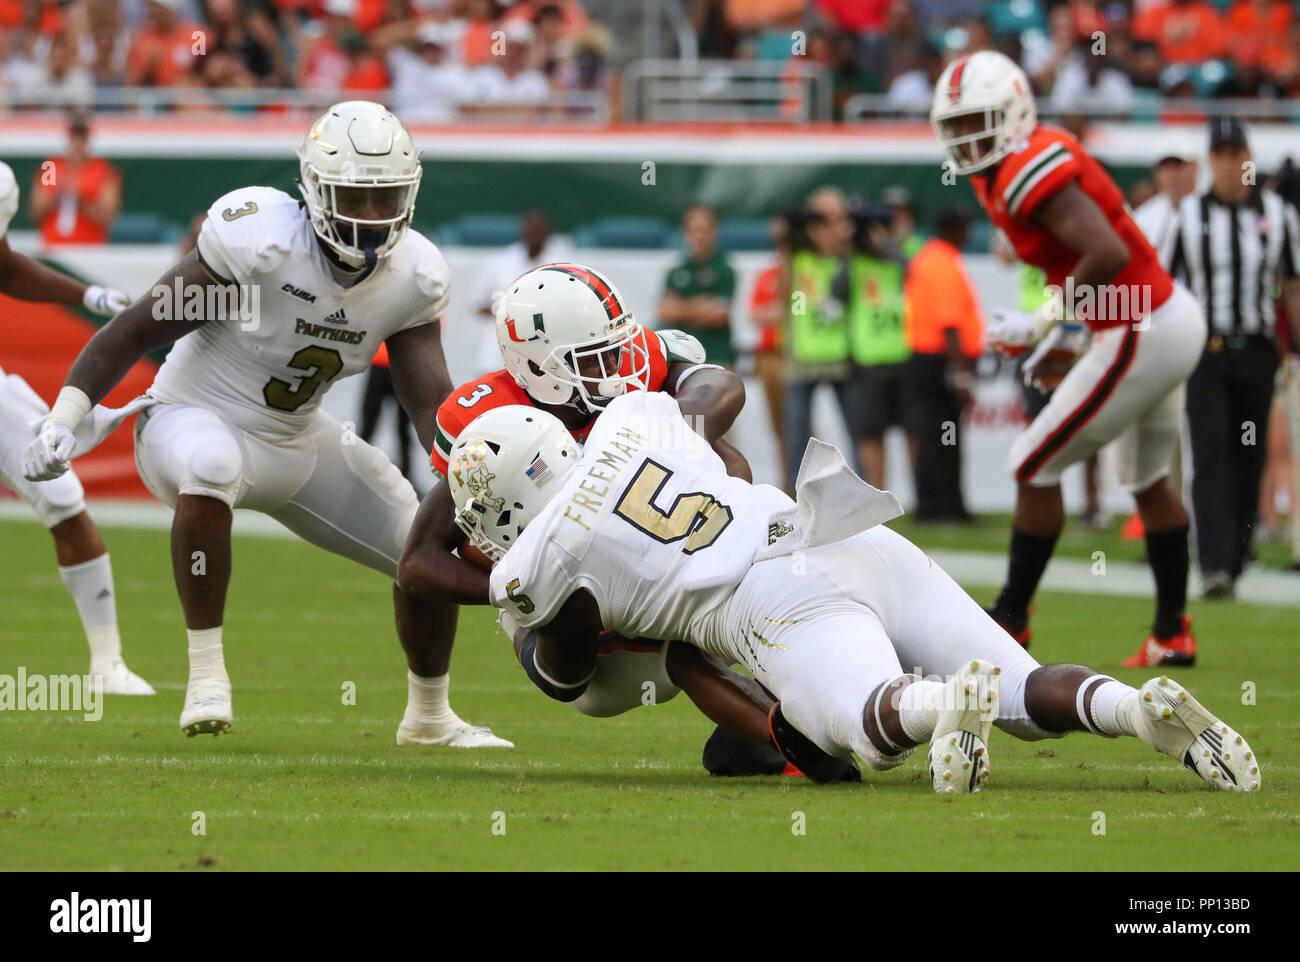 Miami Gardens Florida Usa 22nd Sep 2018 Fiu Panthers Linebacker